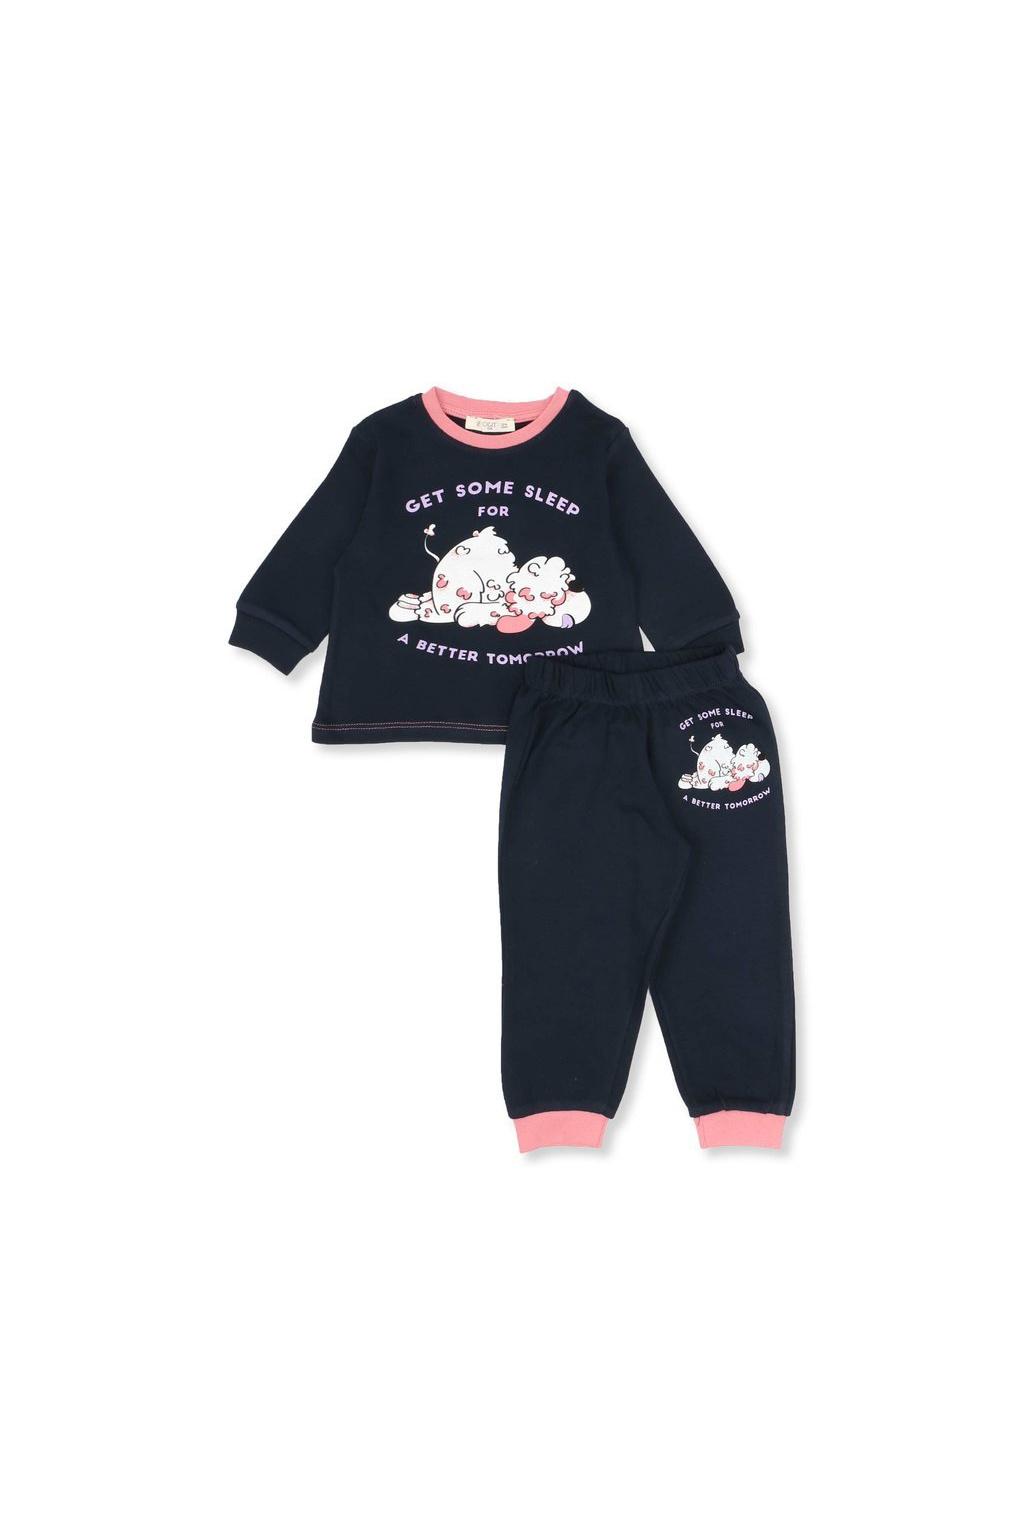 Dětské pyžamo Get some sleep - 2-dílná souprava